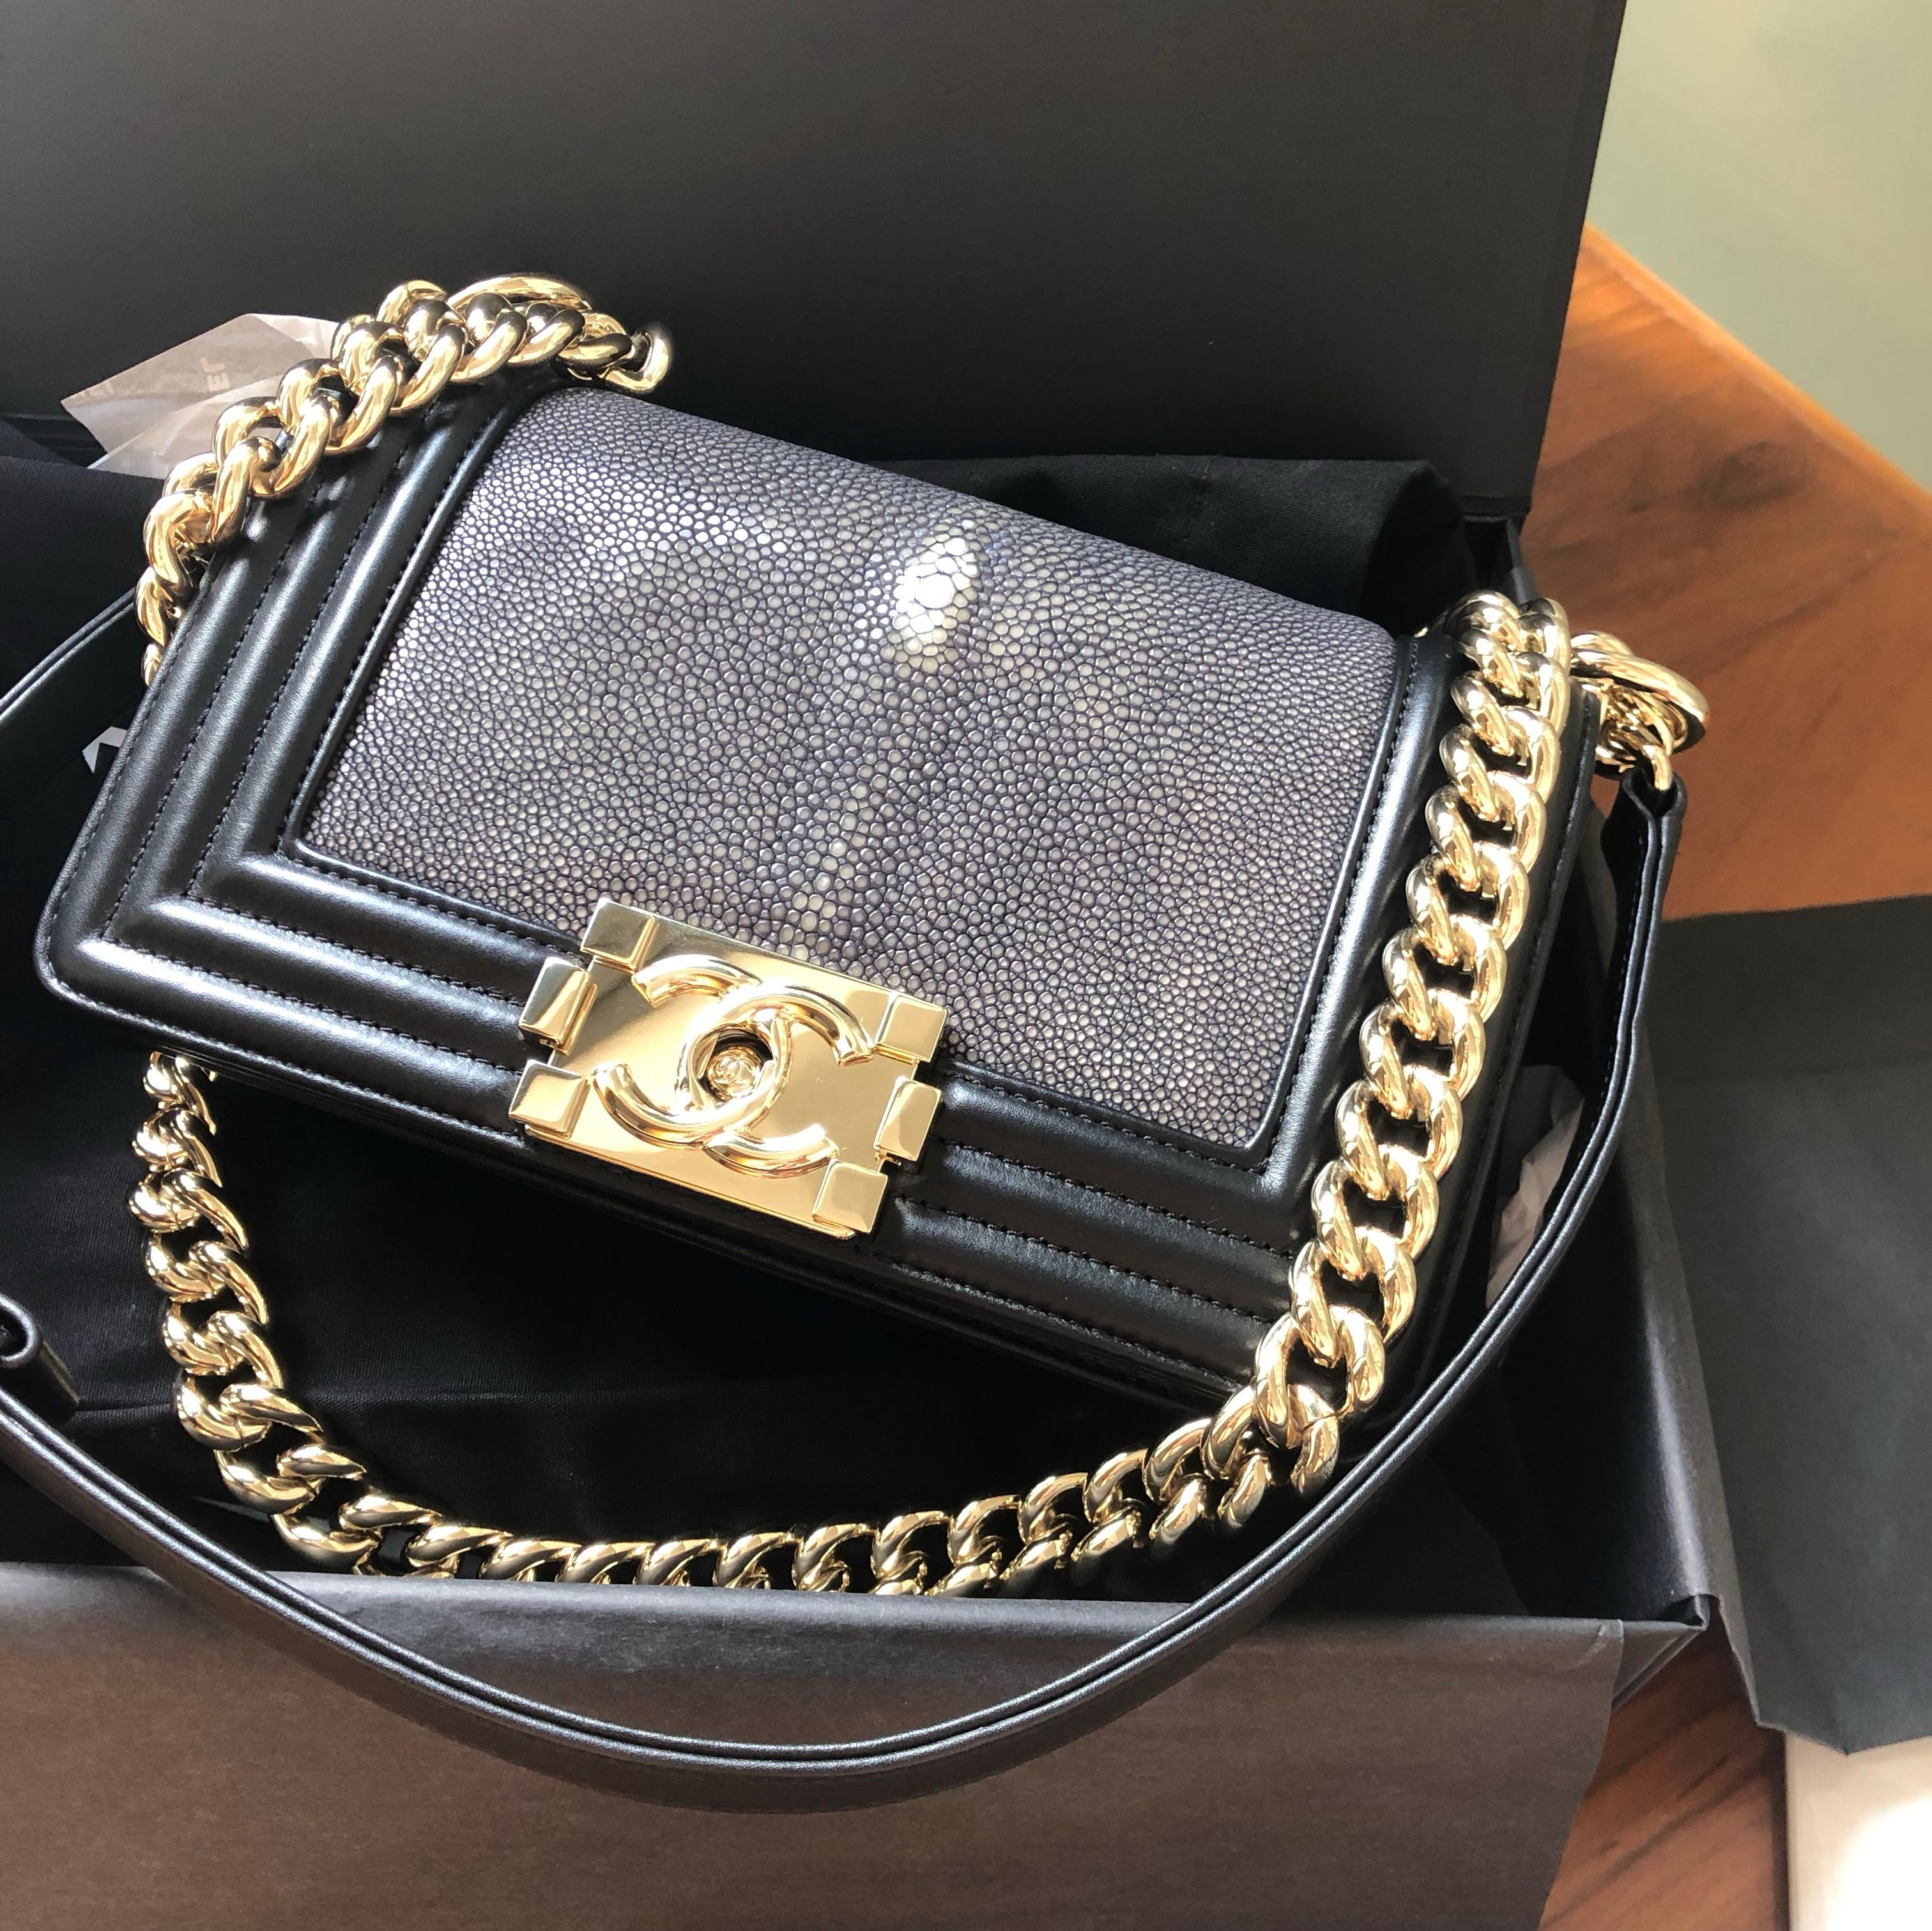 074f3350bb5d Brand new Chanel boy mini (stingray), Luxury, Bags & Wallets, Handbags on  Carousell